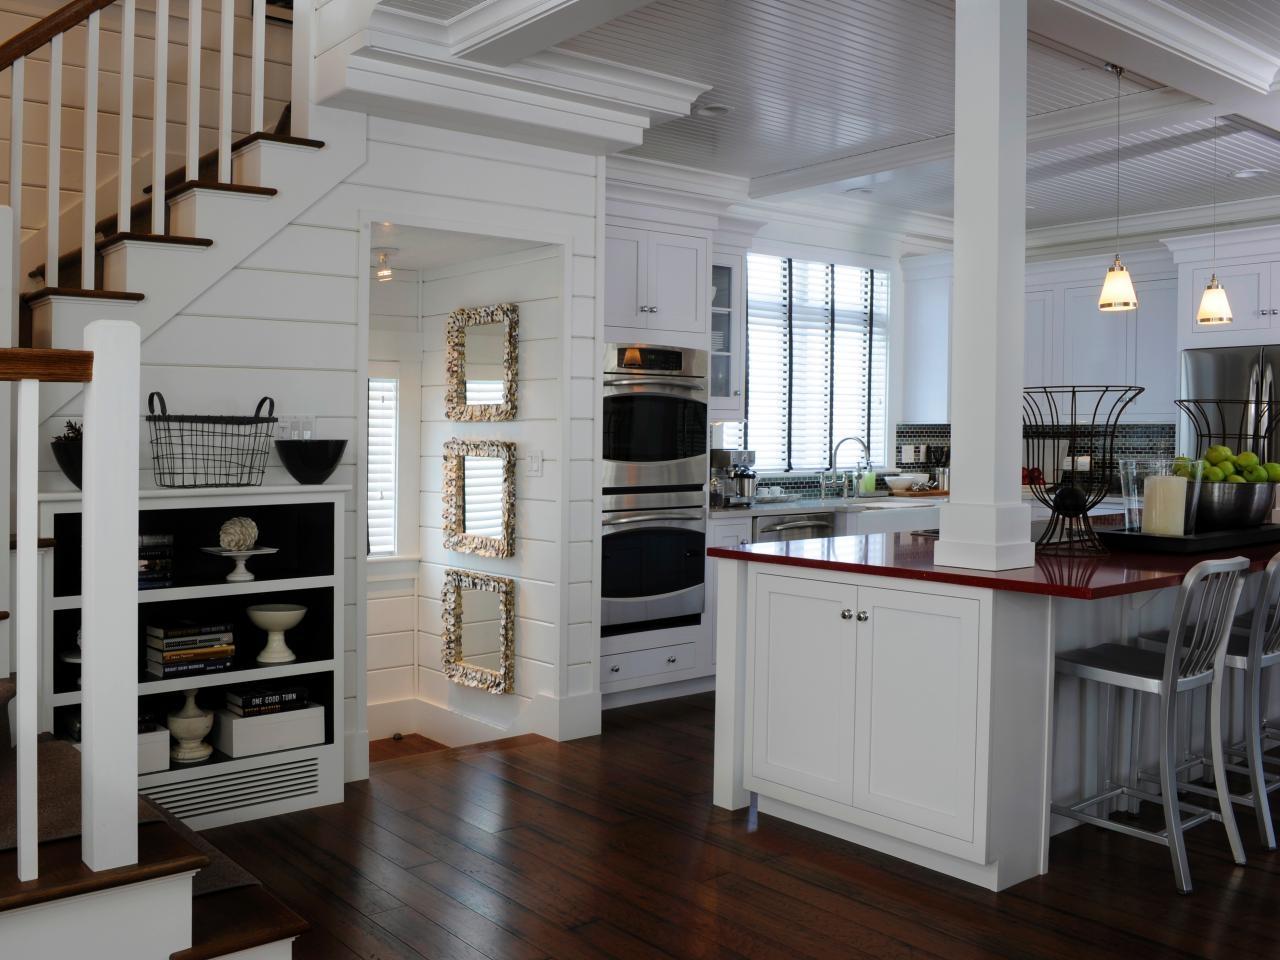 Kitchen Island With Support Columns Decoration